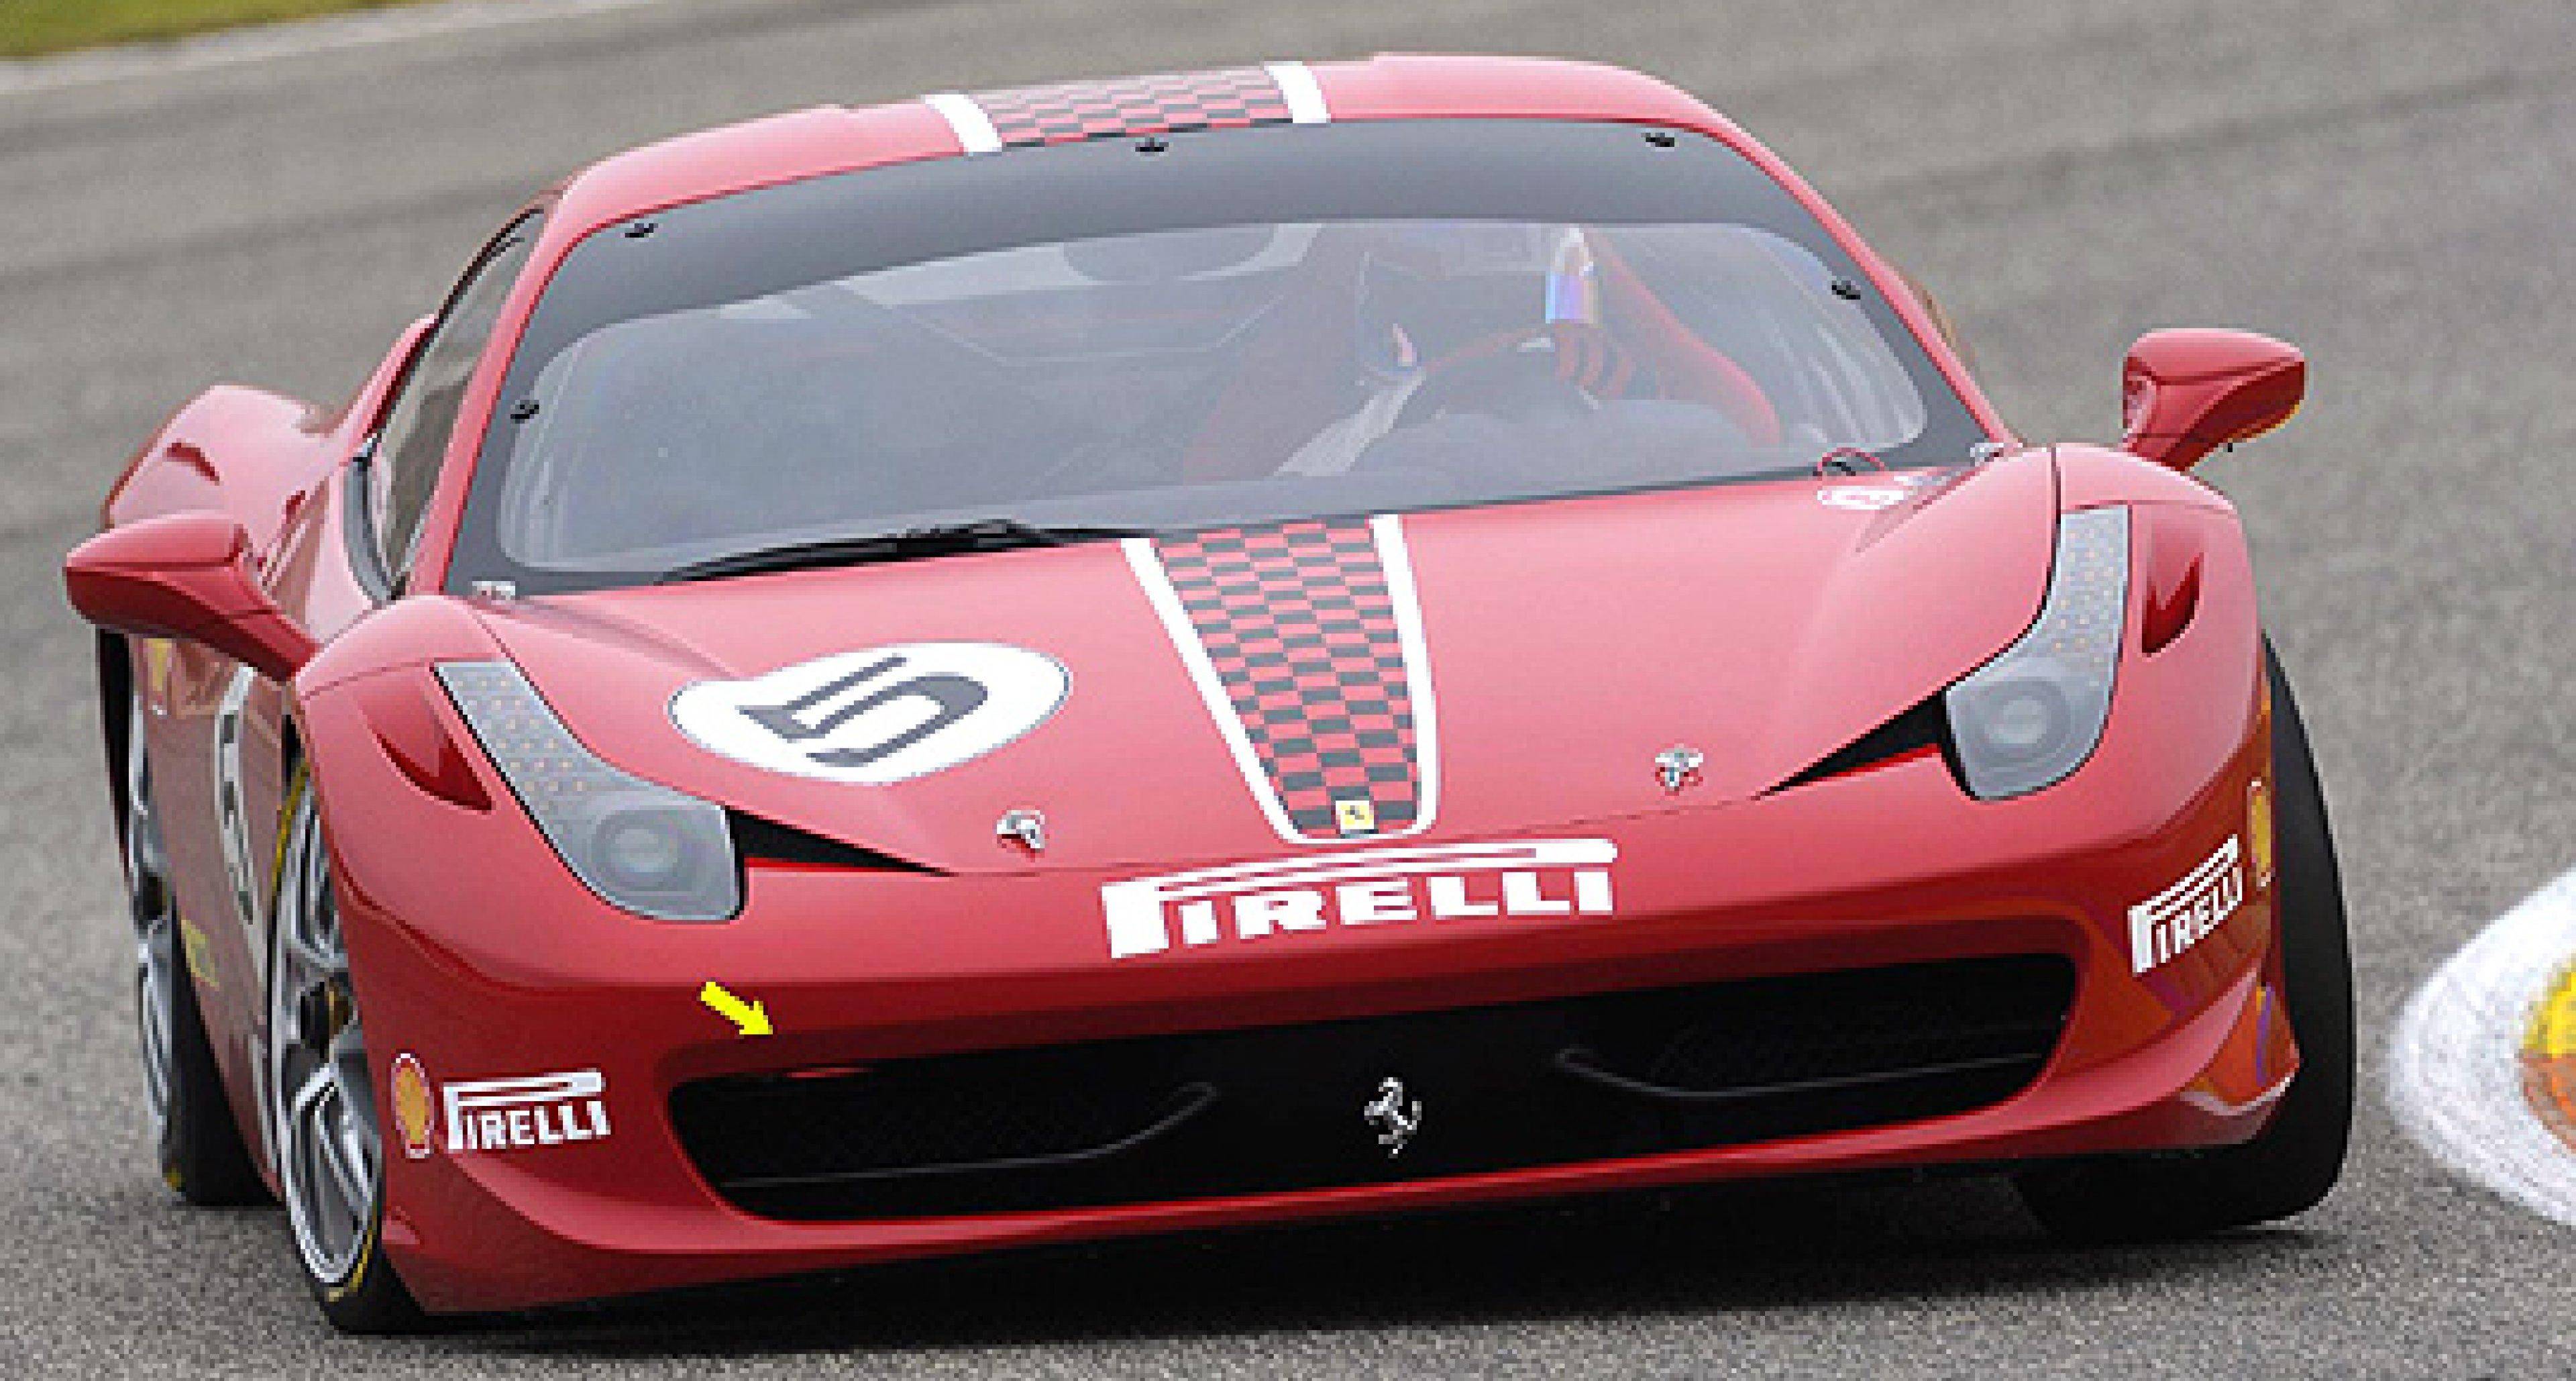 Ferrari 458 Challenge Revealed at Bologna